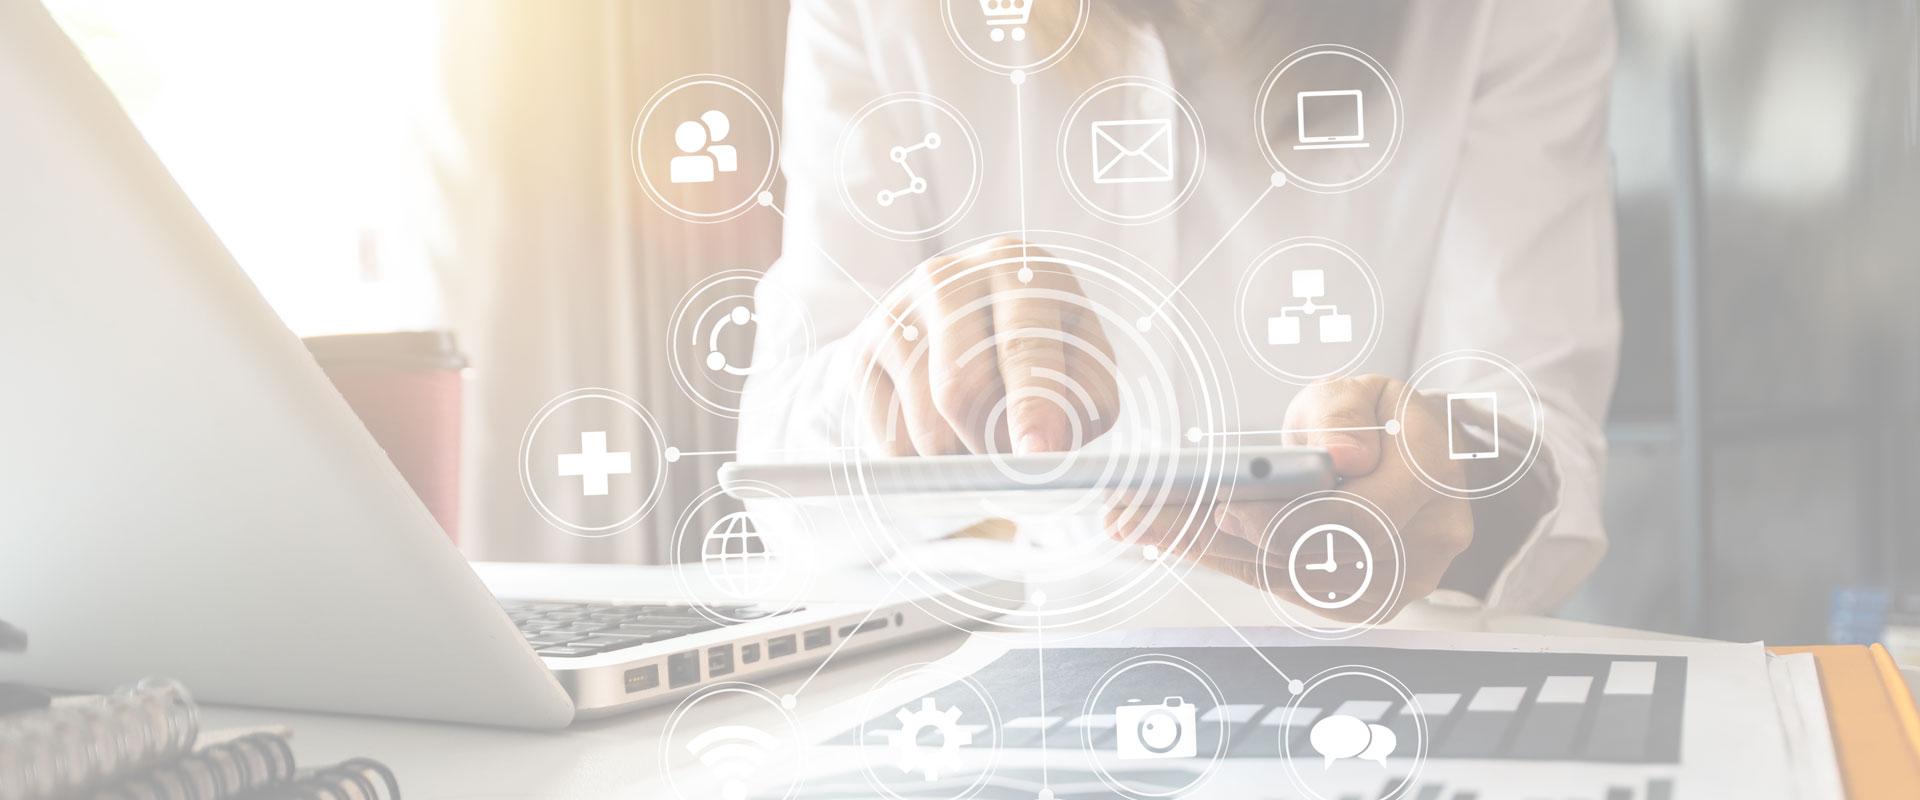 Improve your webmarketing